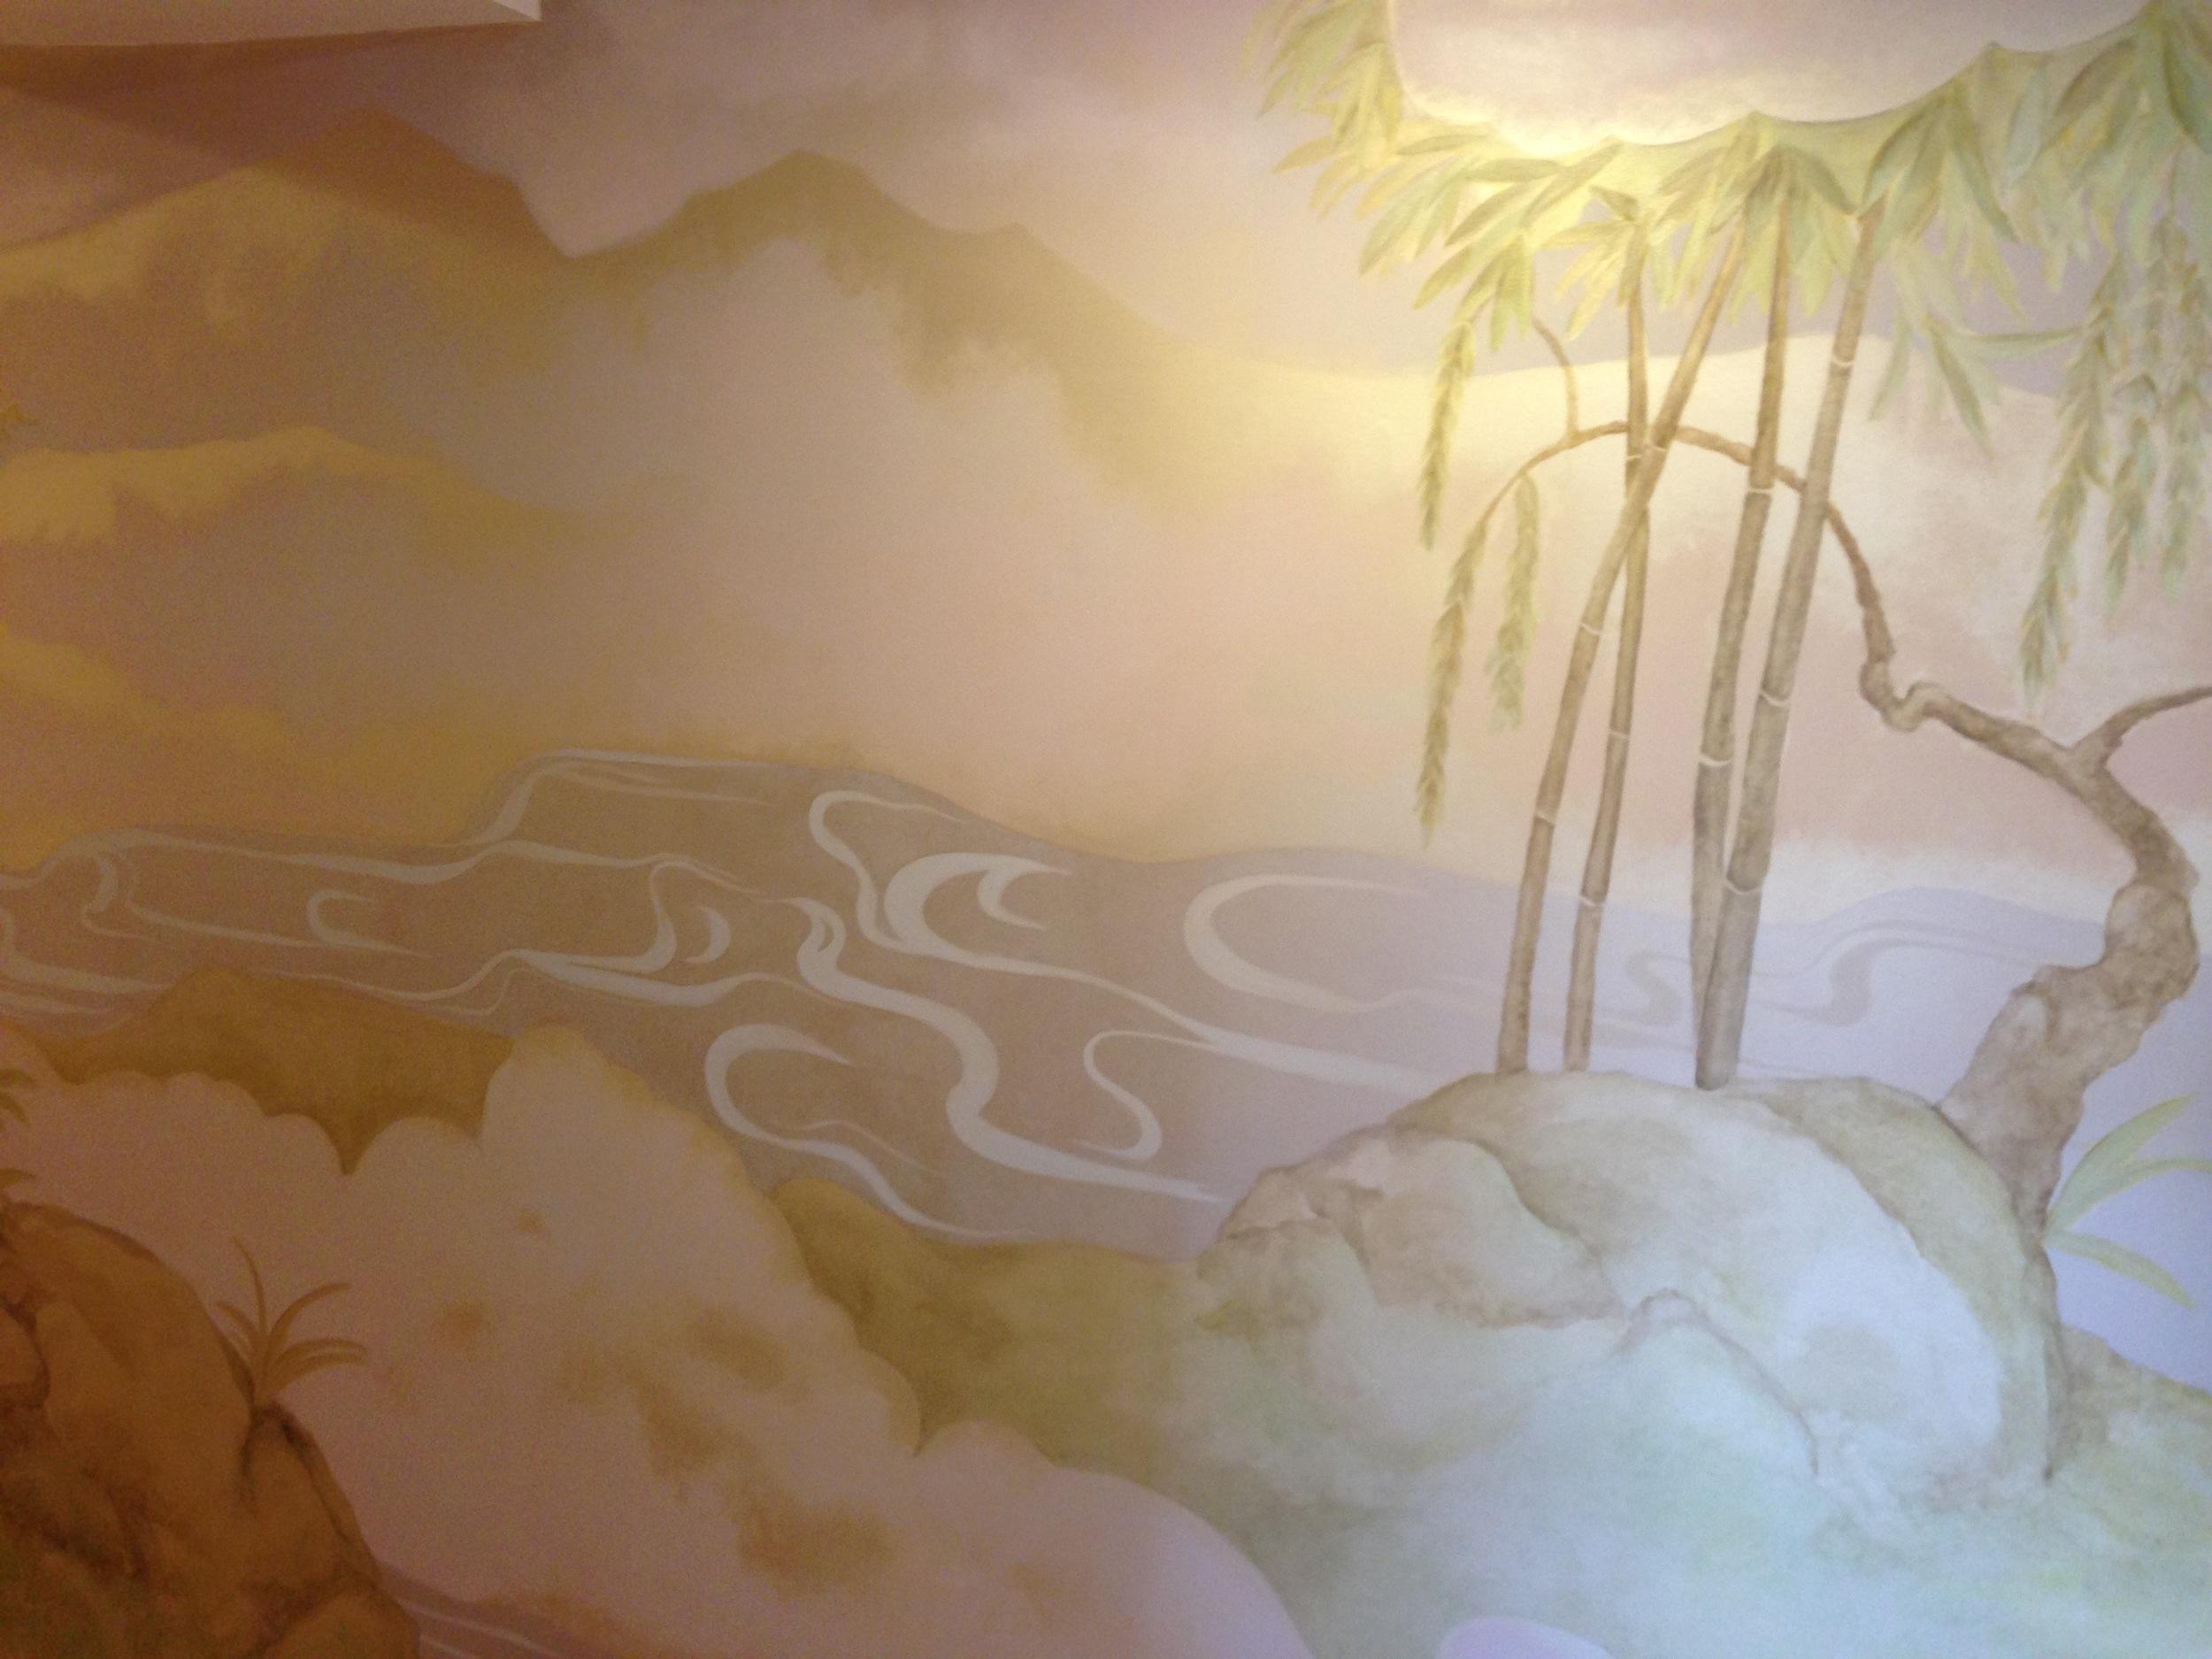 Shambala Spa Japaneese mural